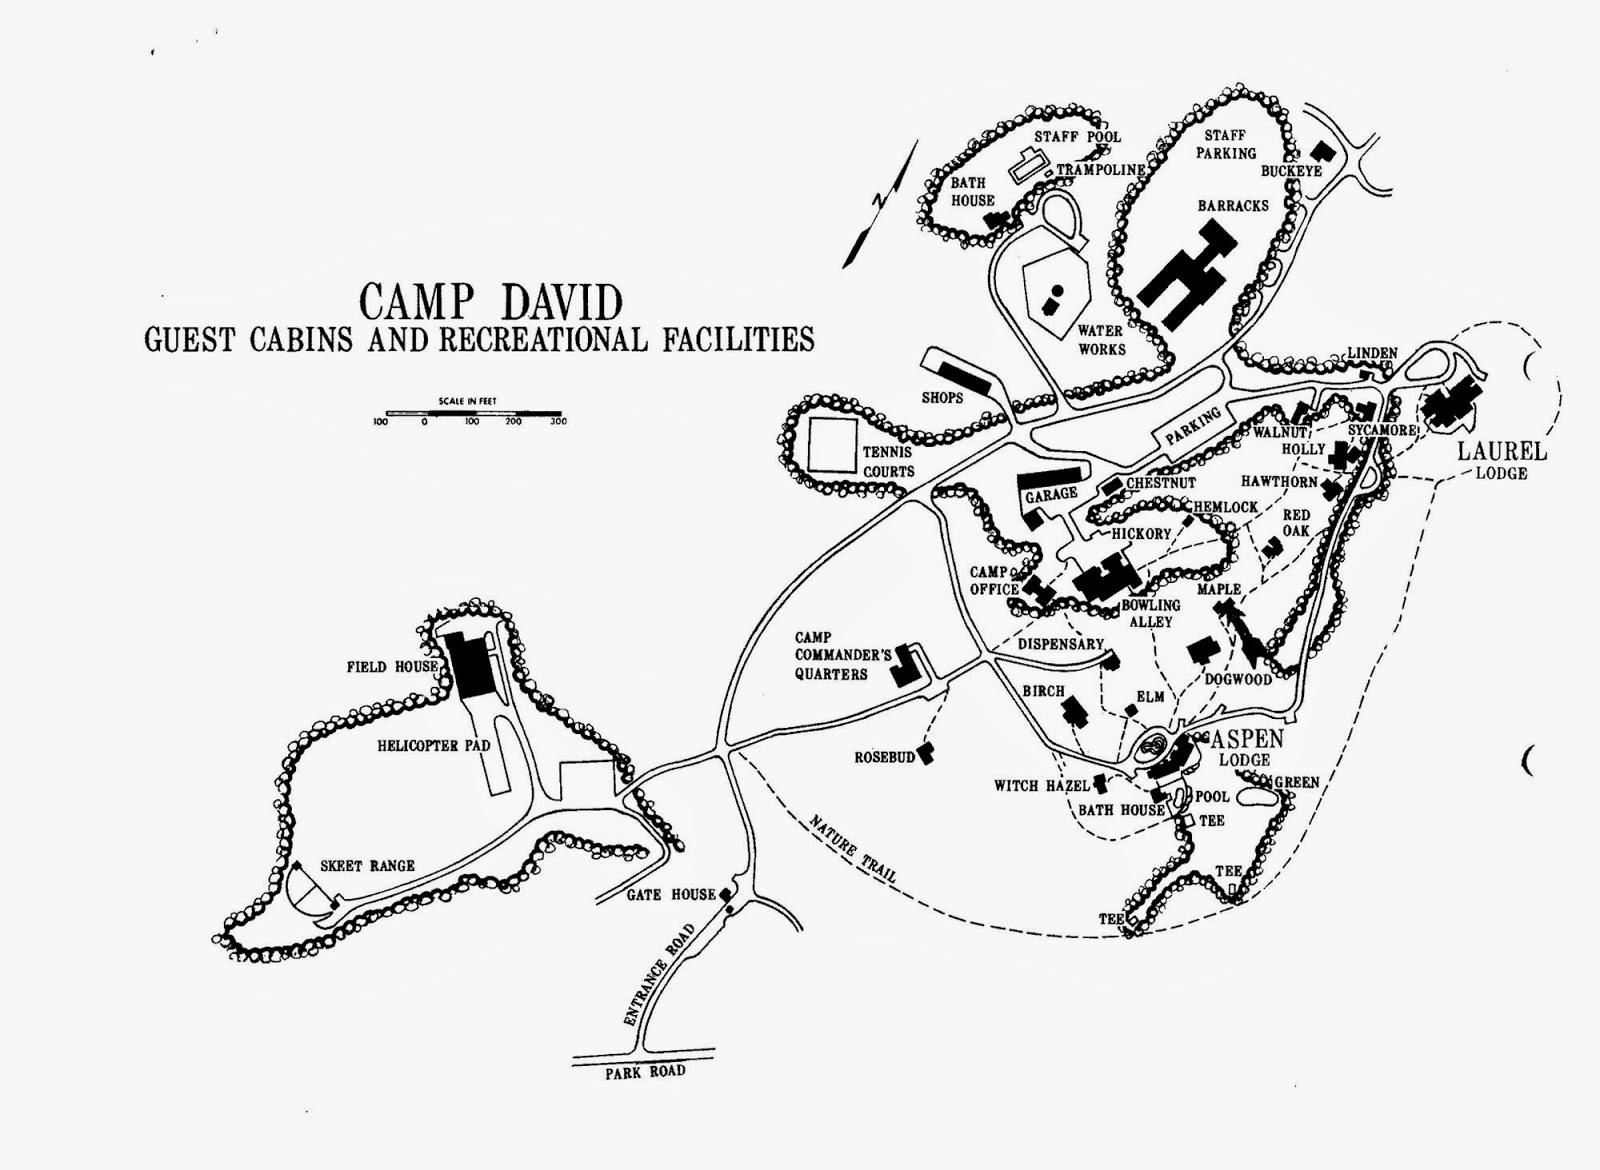 About Camp David: Weekend Meeting at Camp David